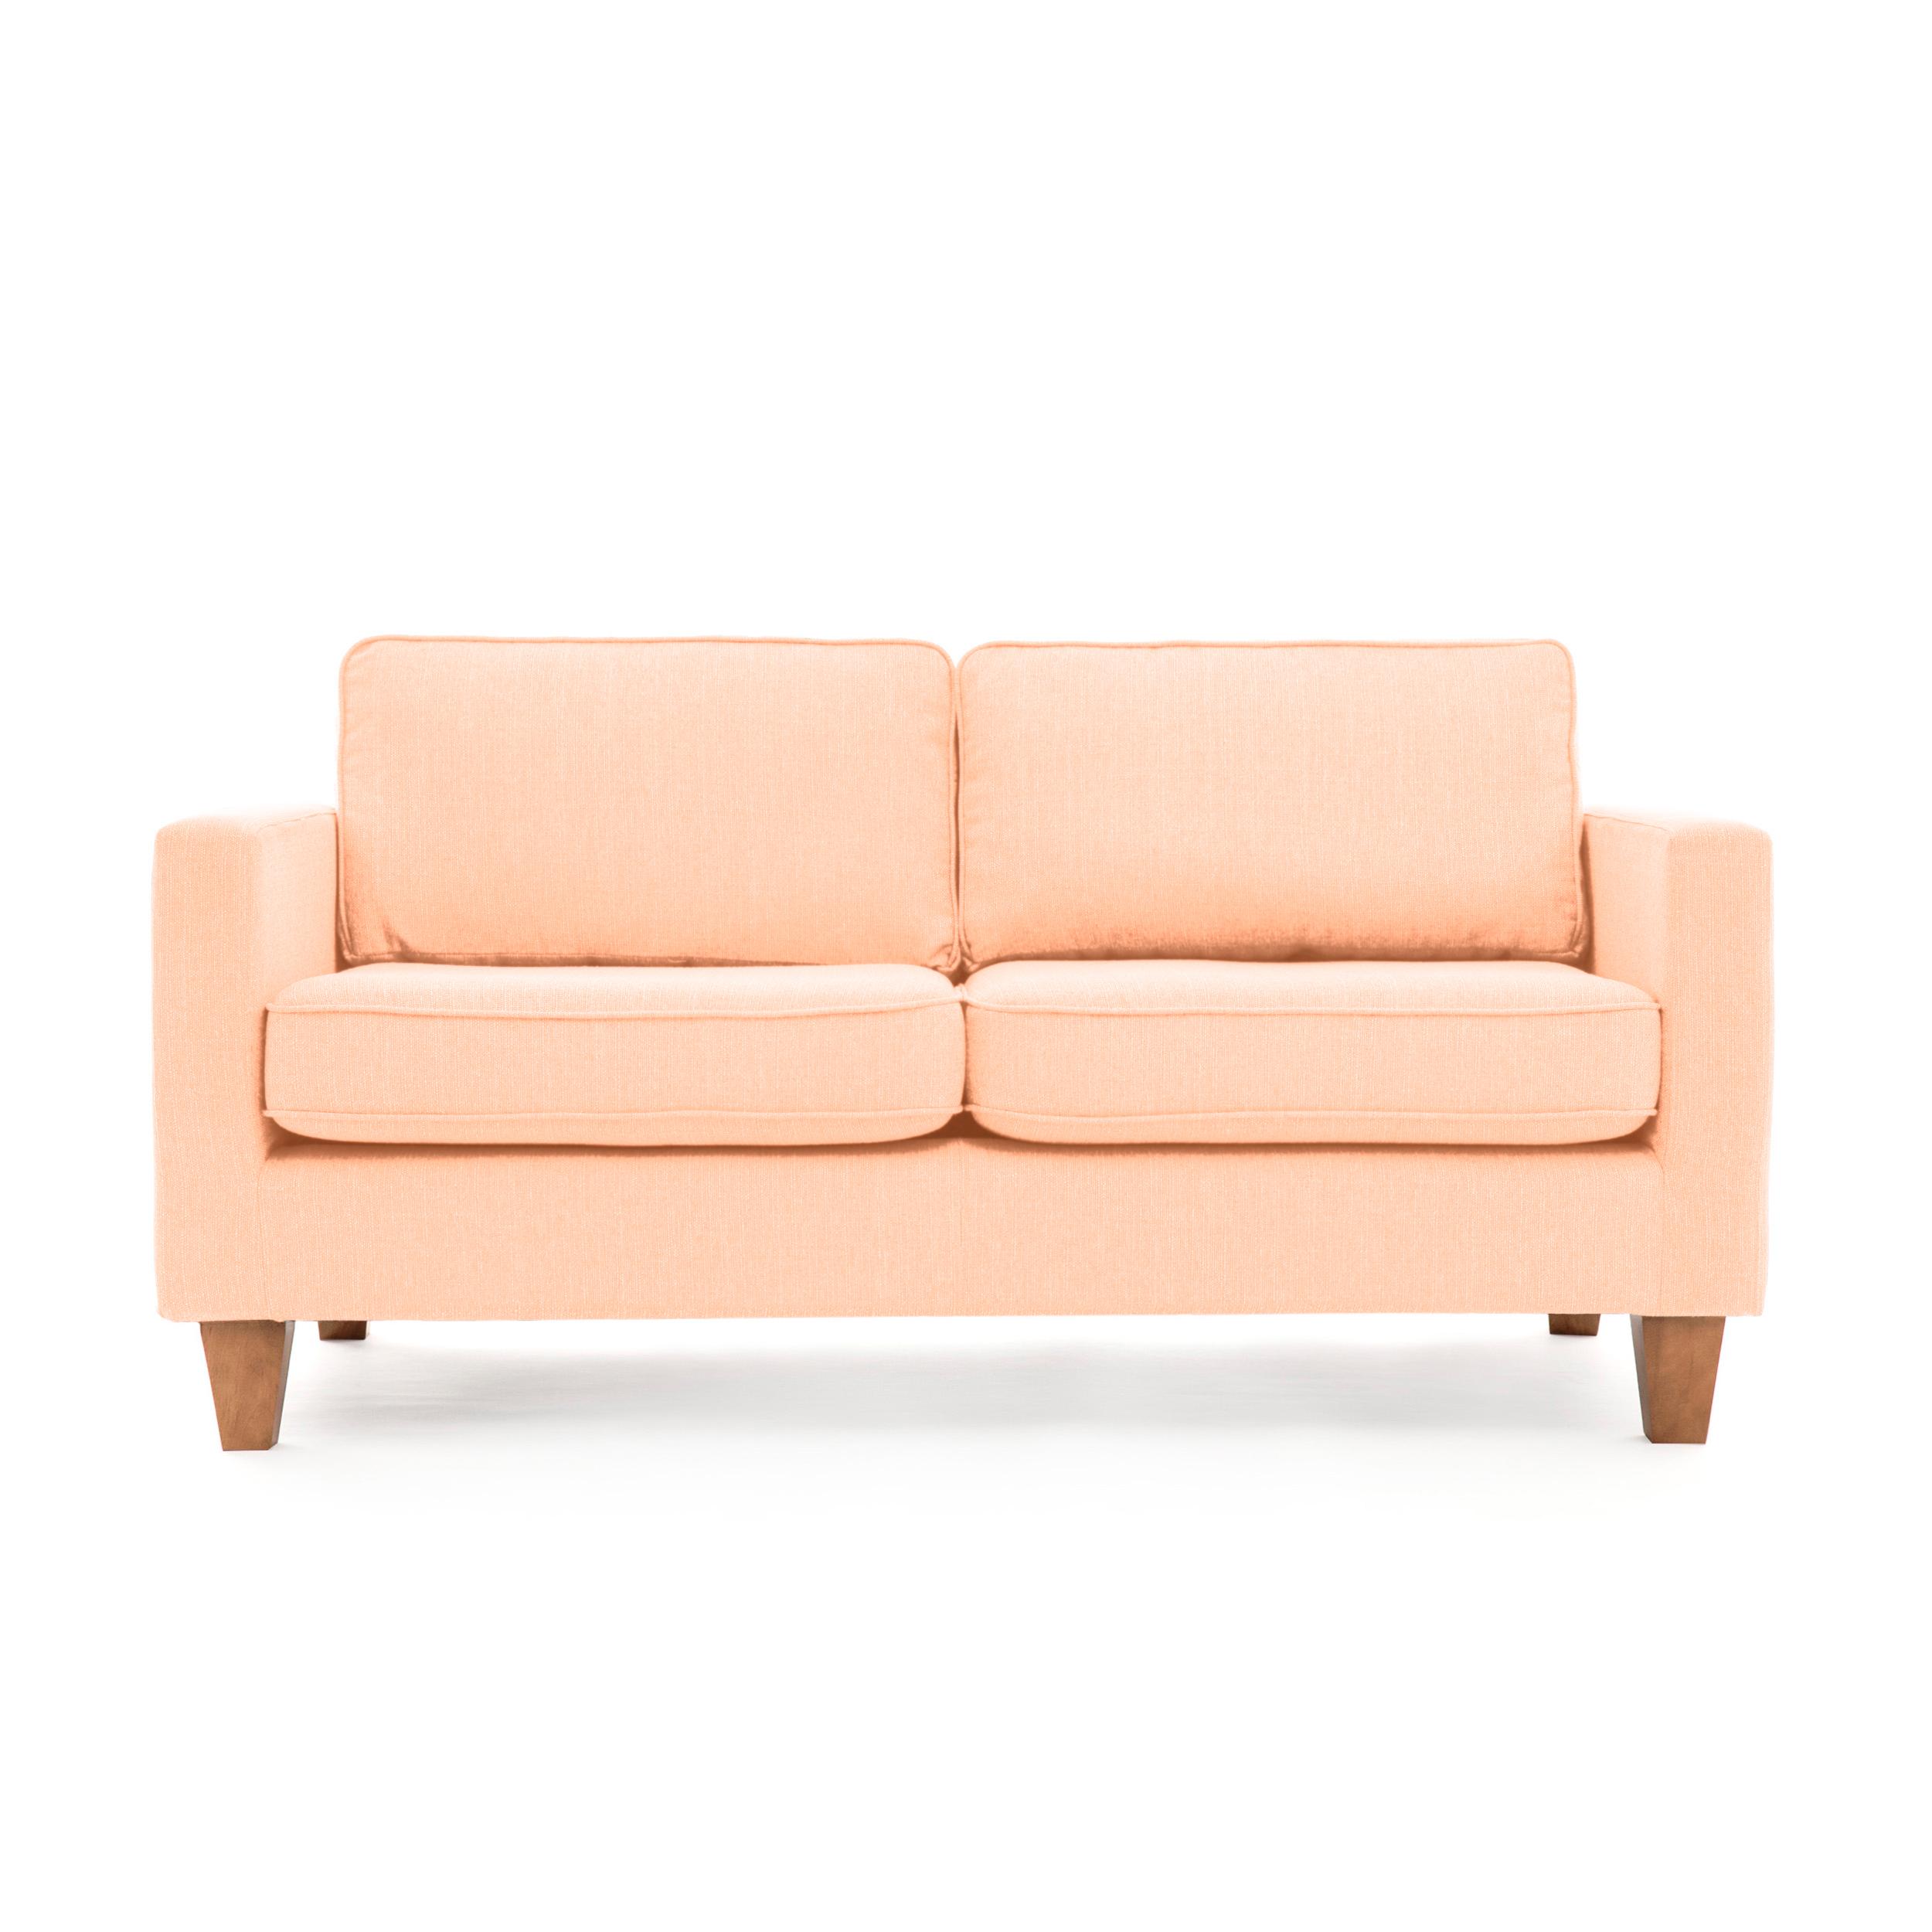 Canapea Fixa 3 locuri Sorio Light pink